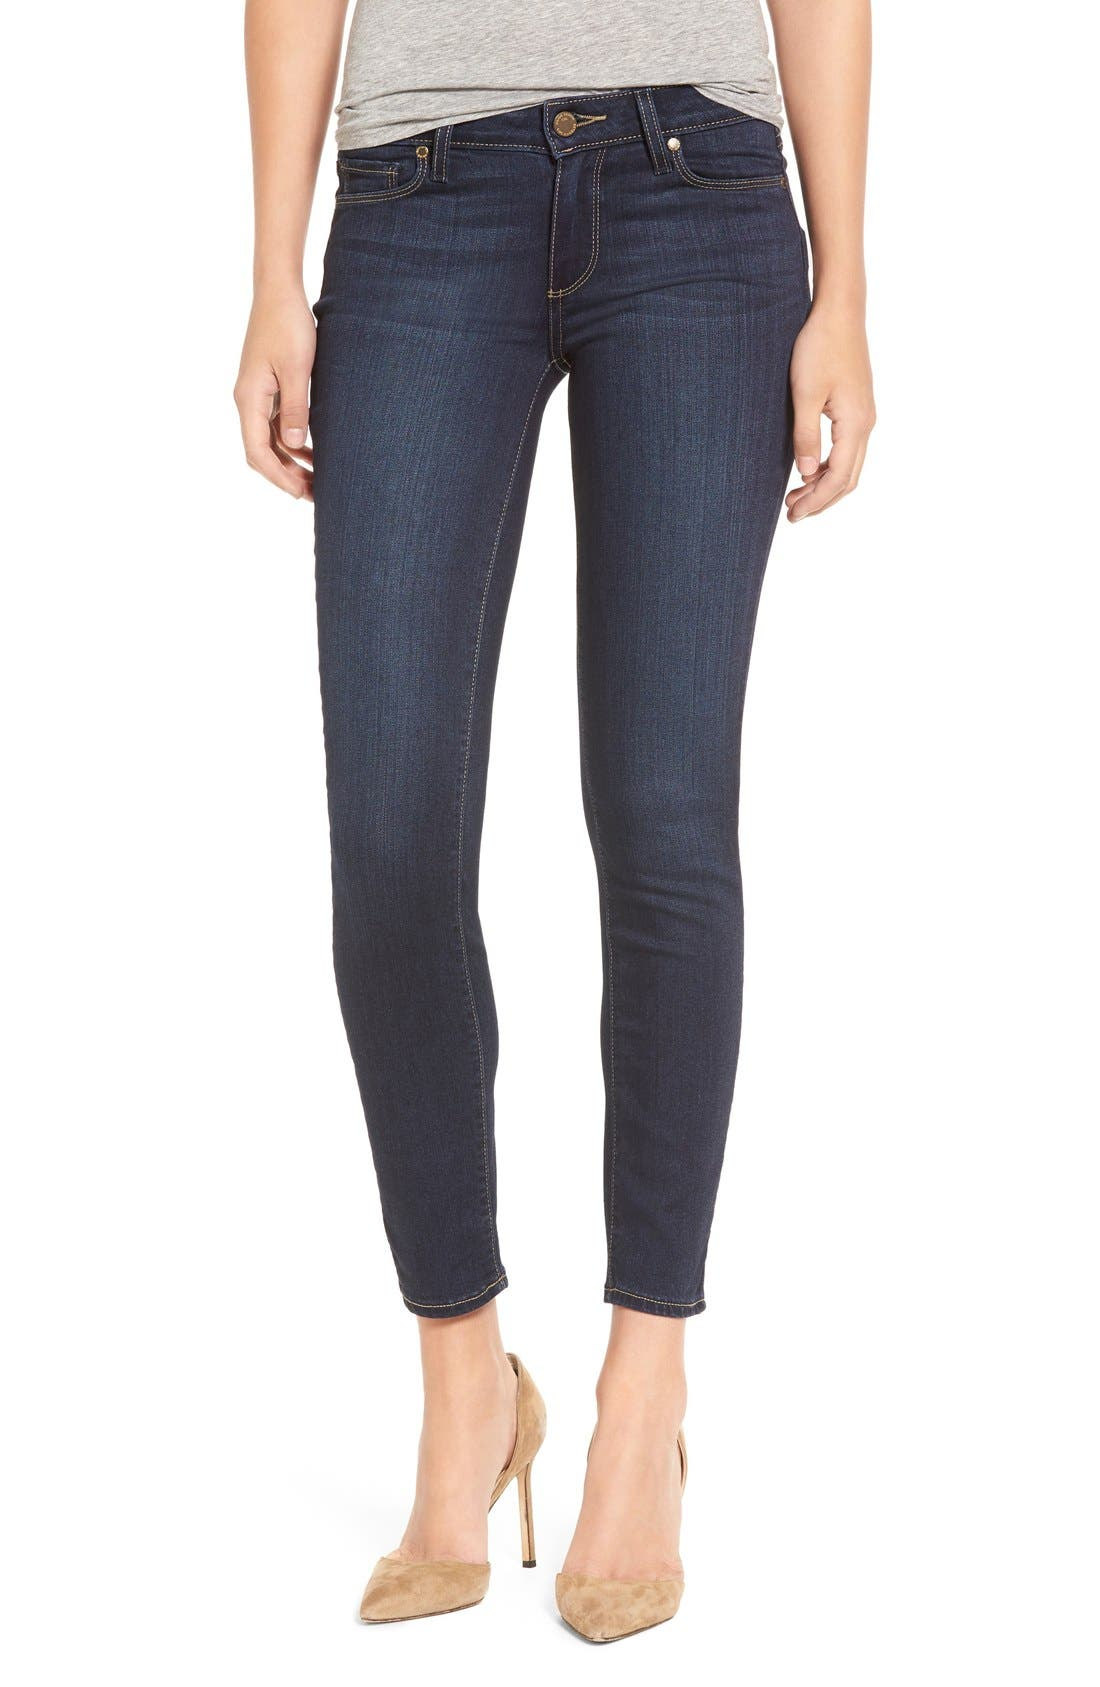 Transcend - Verdugo Ankle Ultra Skinny Jeans,                         Main,                         color, Hartmann